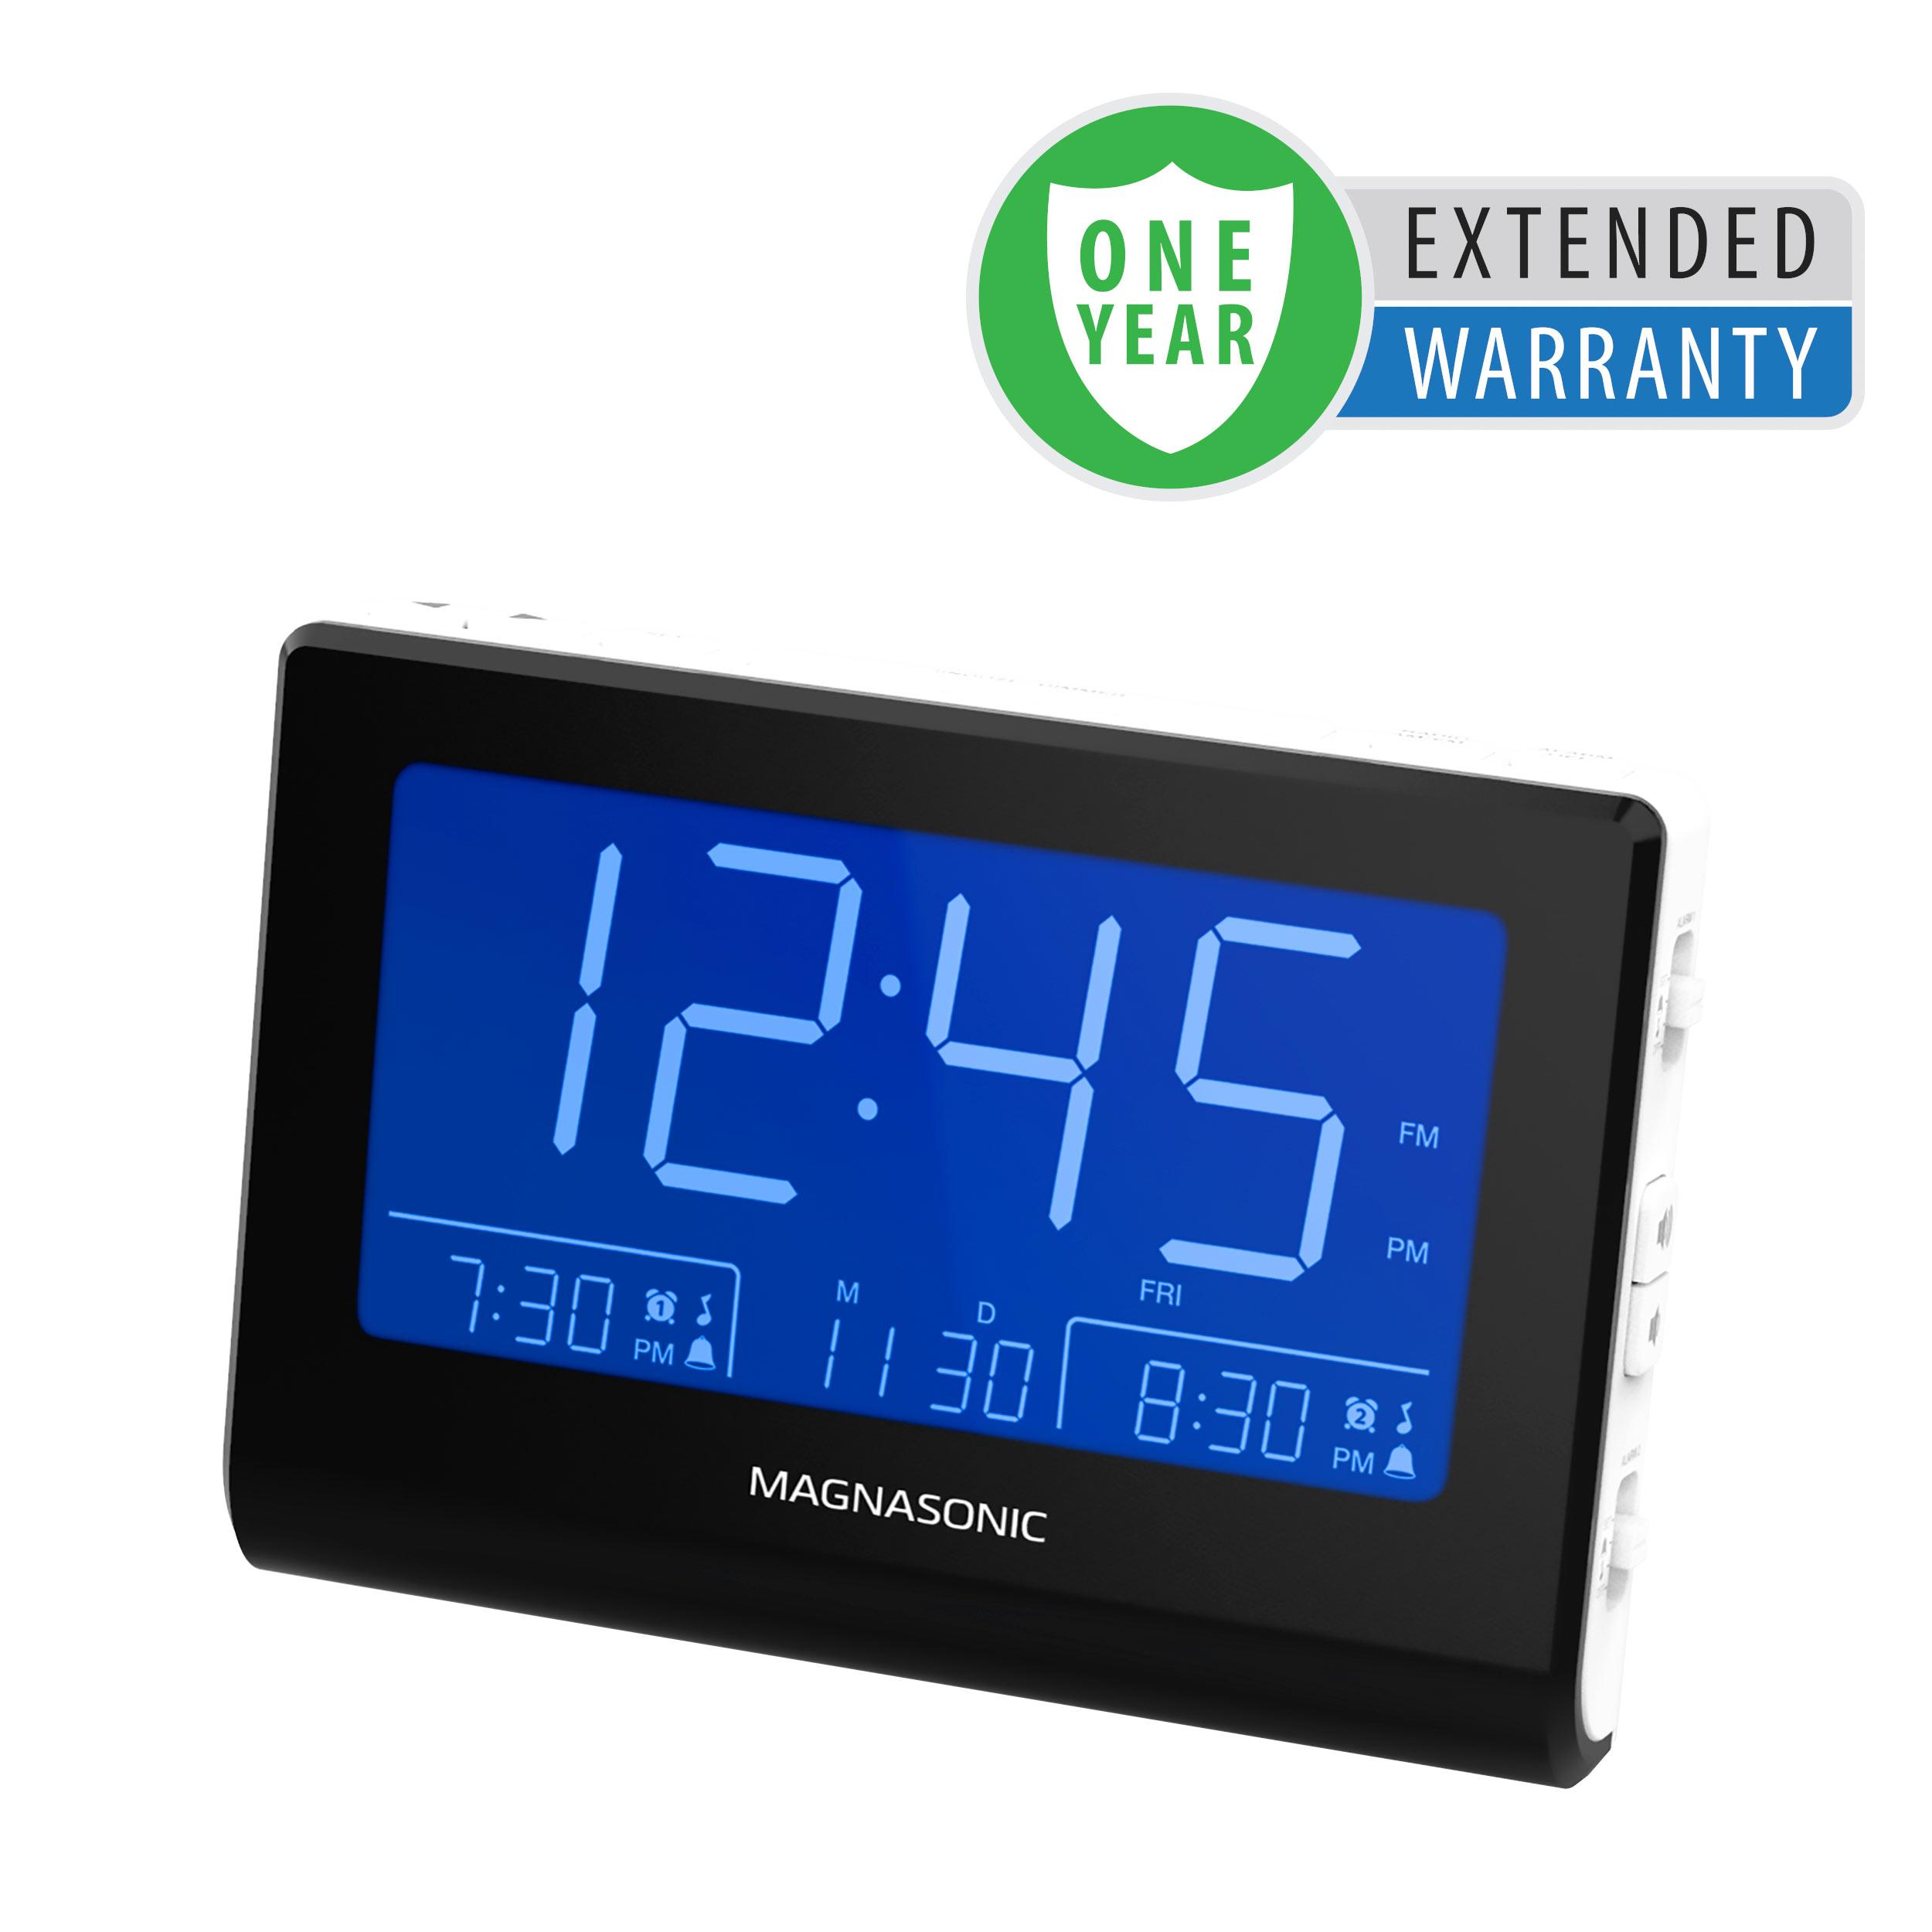 "Magnasonic Alarm Clock Radio with Battery Backup, Dual Gradual Wake Alarm, Adjustable Brightness, Daylight Savings Time, Large 4.8"" LED Display, AM/FM, Sleep Timer - 1 Year Extended Warranty"